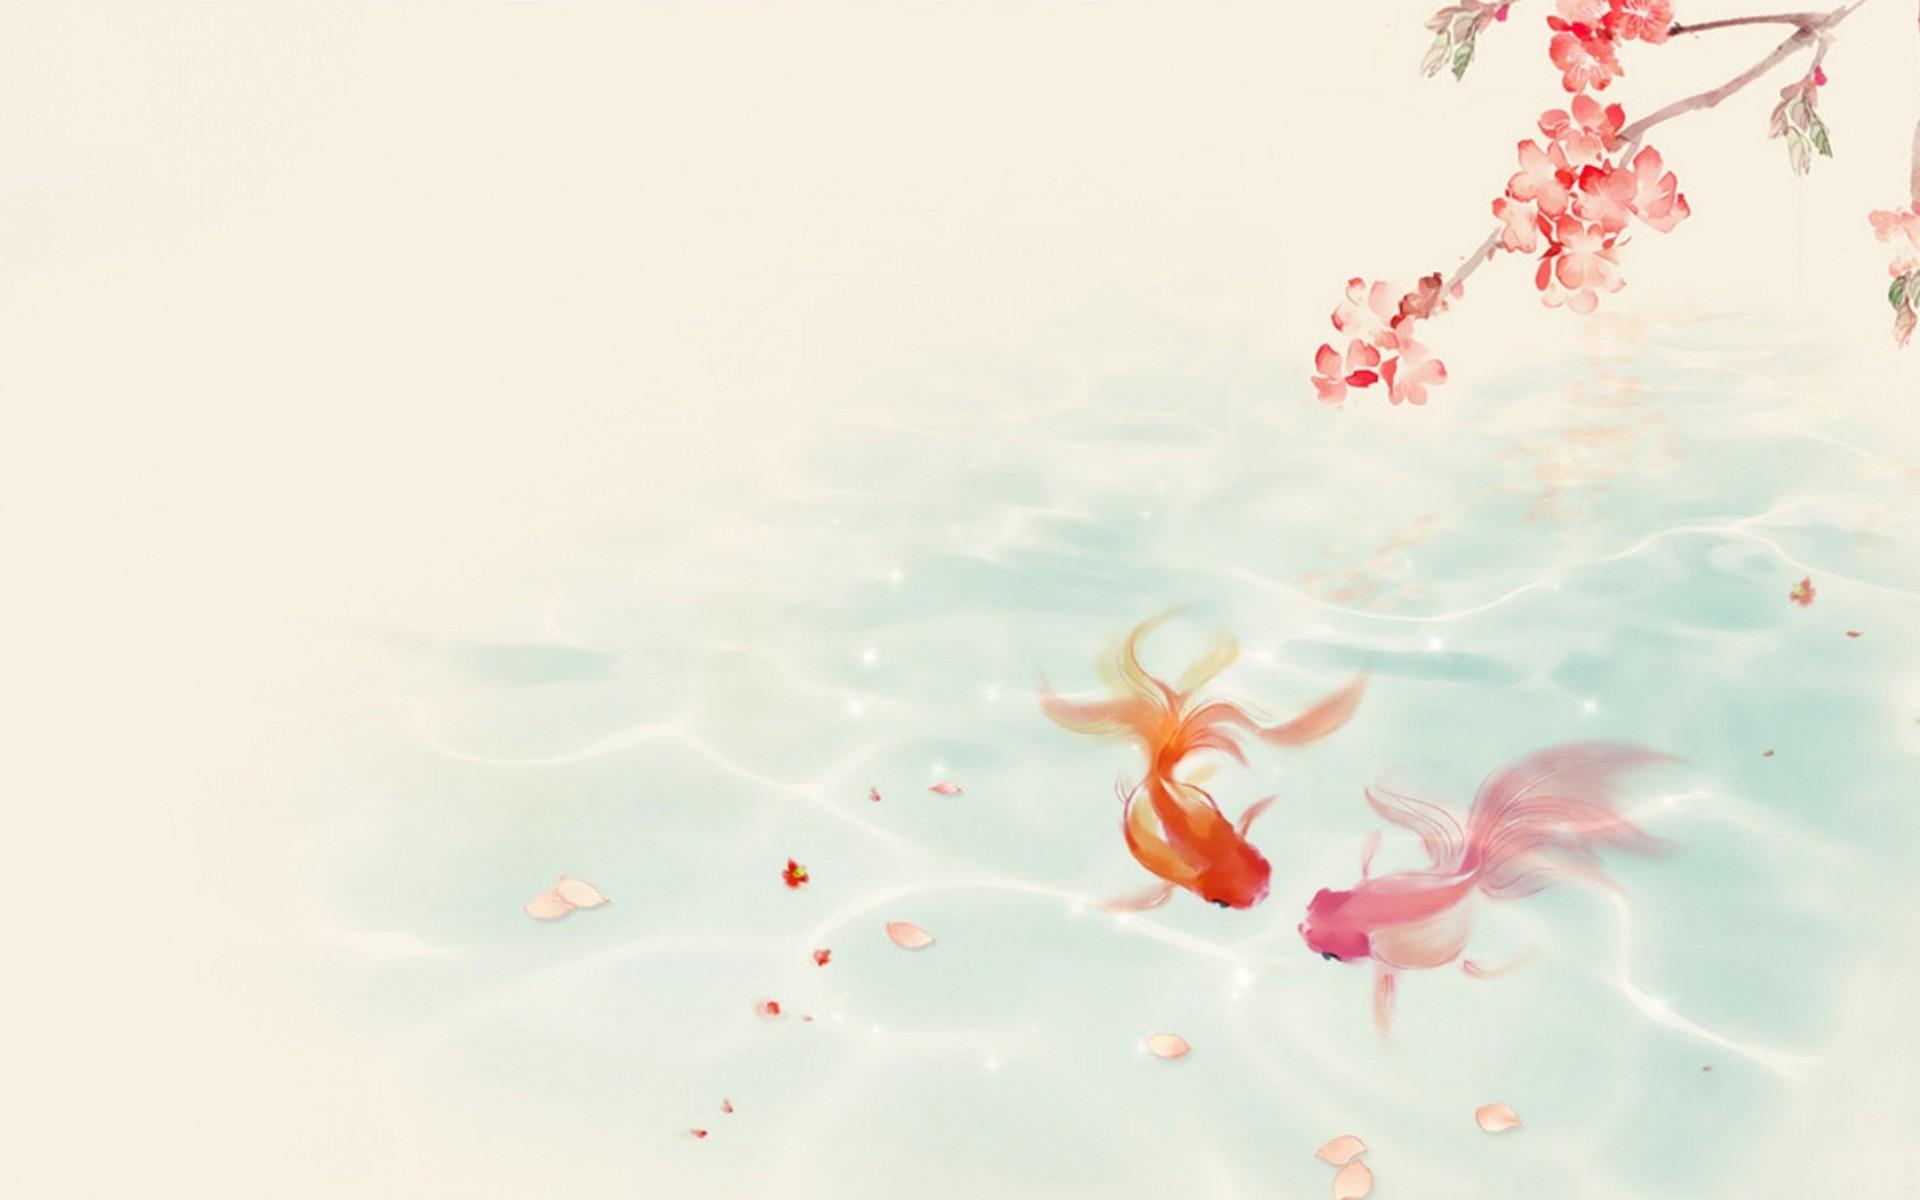 Koi Fish Background 1